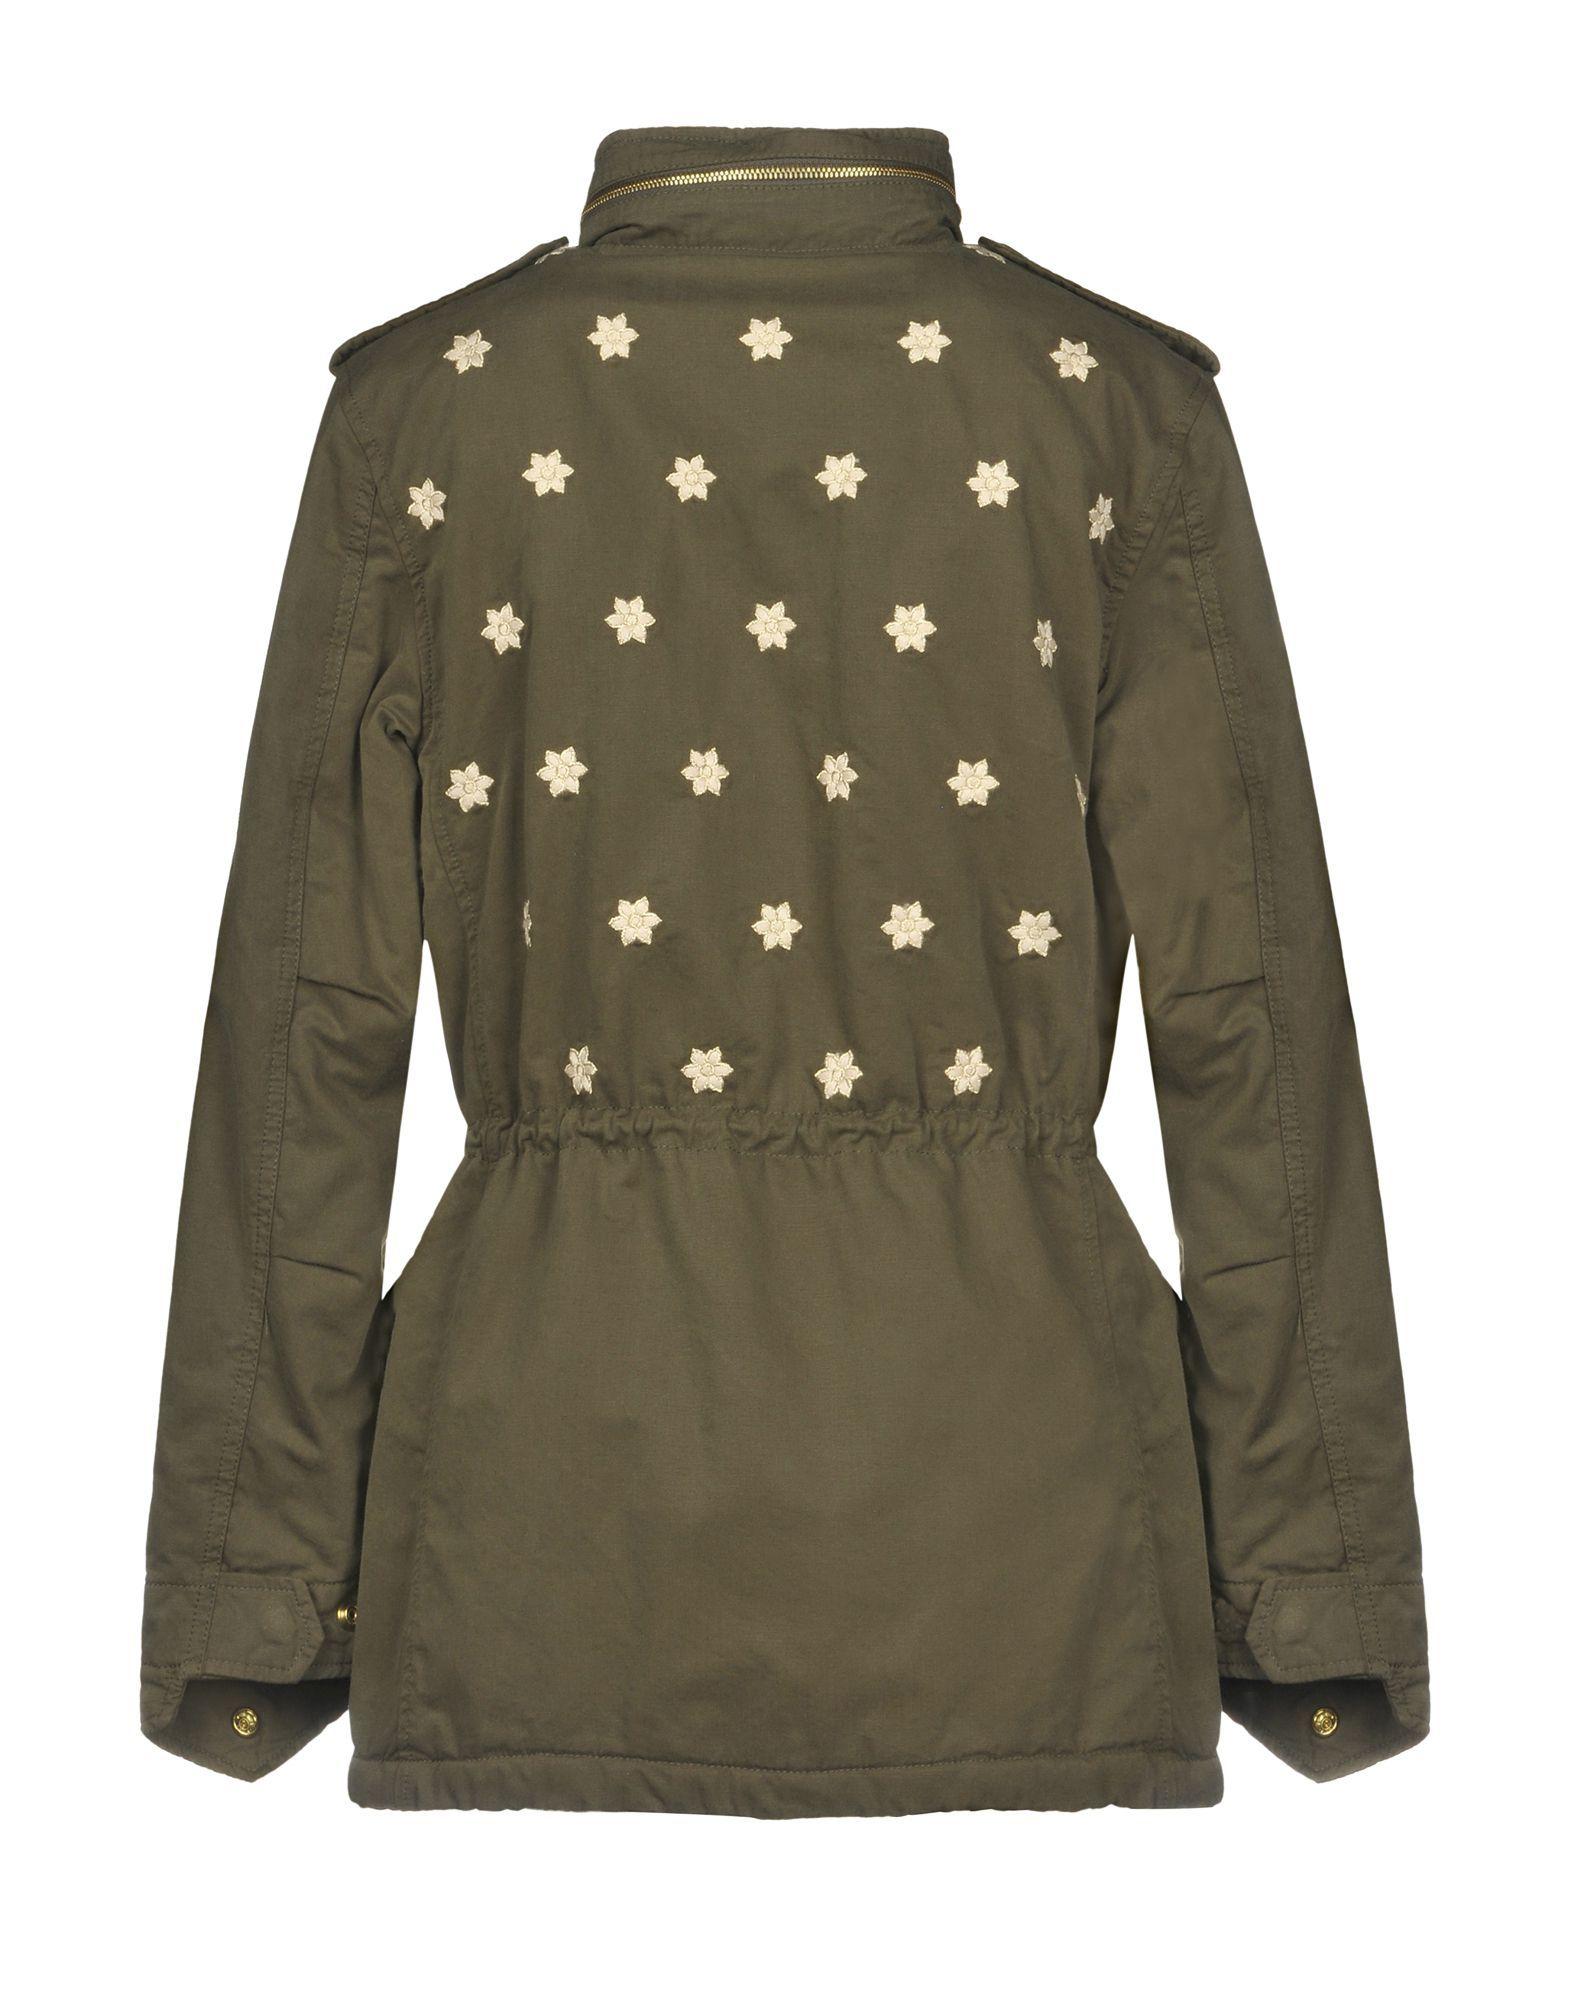 Roÿ Roger's Military Green Cotton Safari Jacket